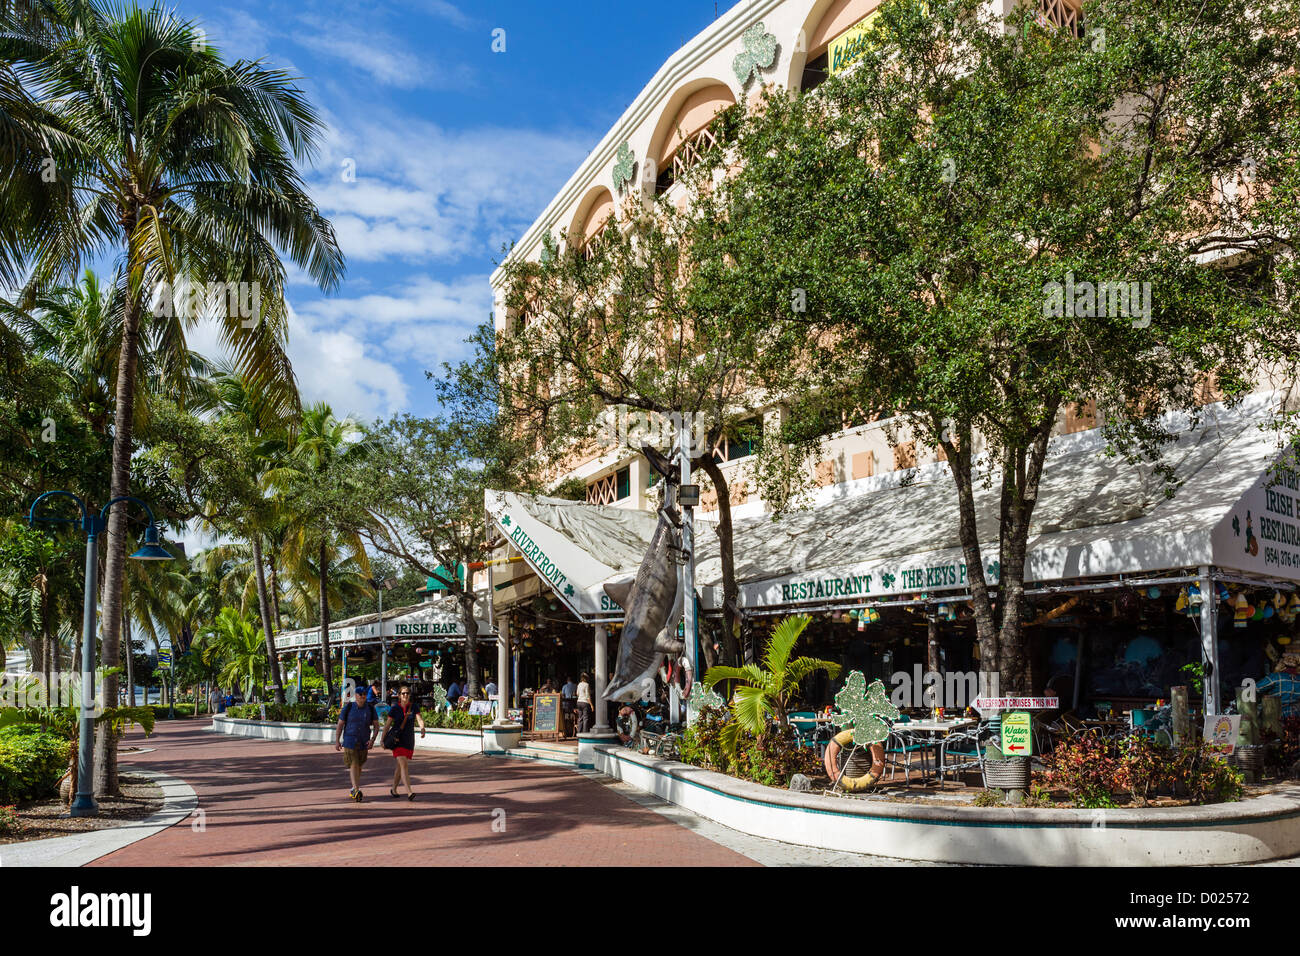 Restaurant At Las Olas Riverfront Development On The